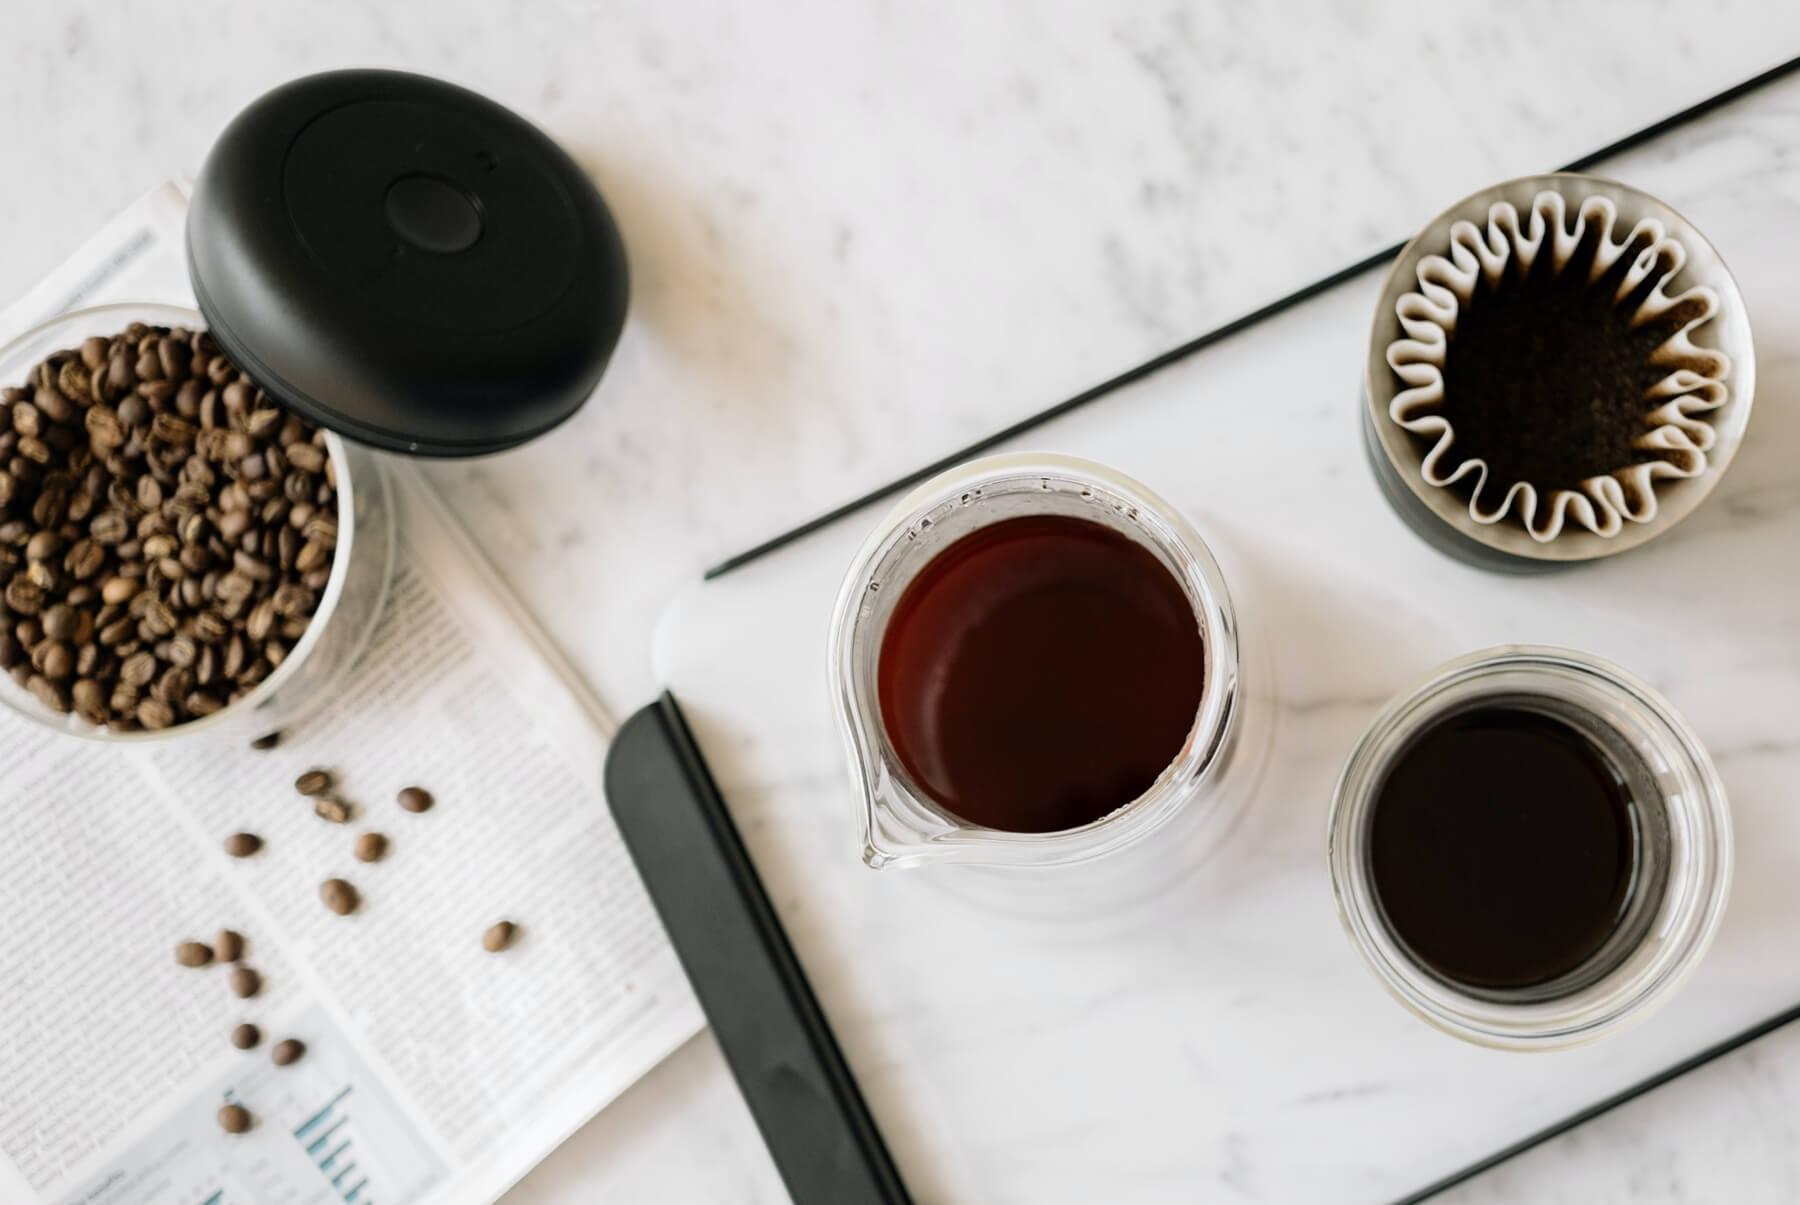 The ultimate home coffee setup